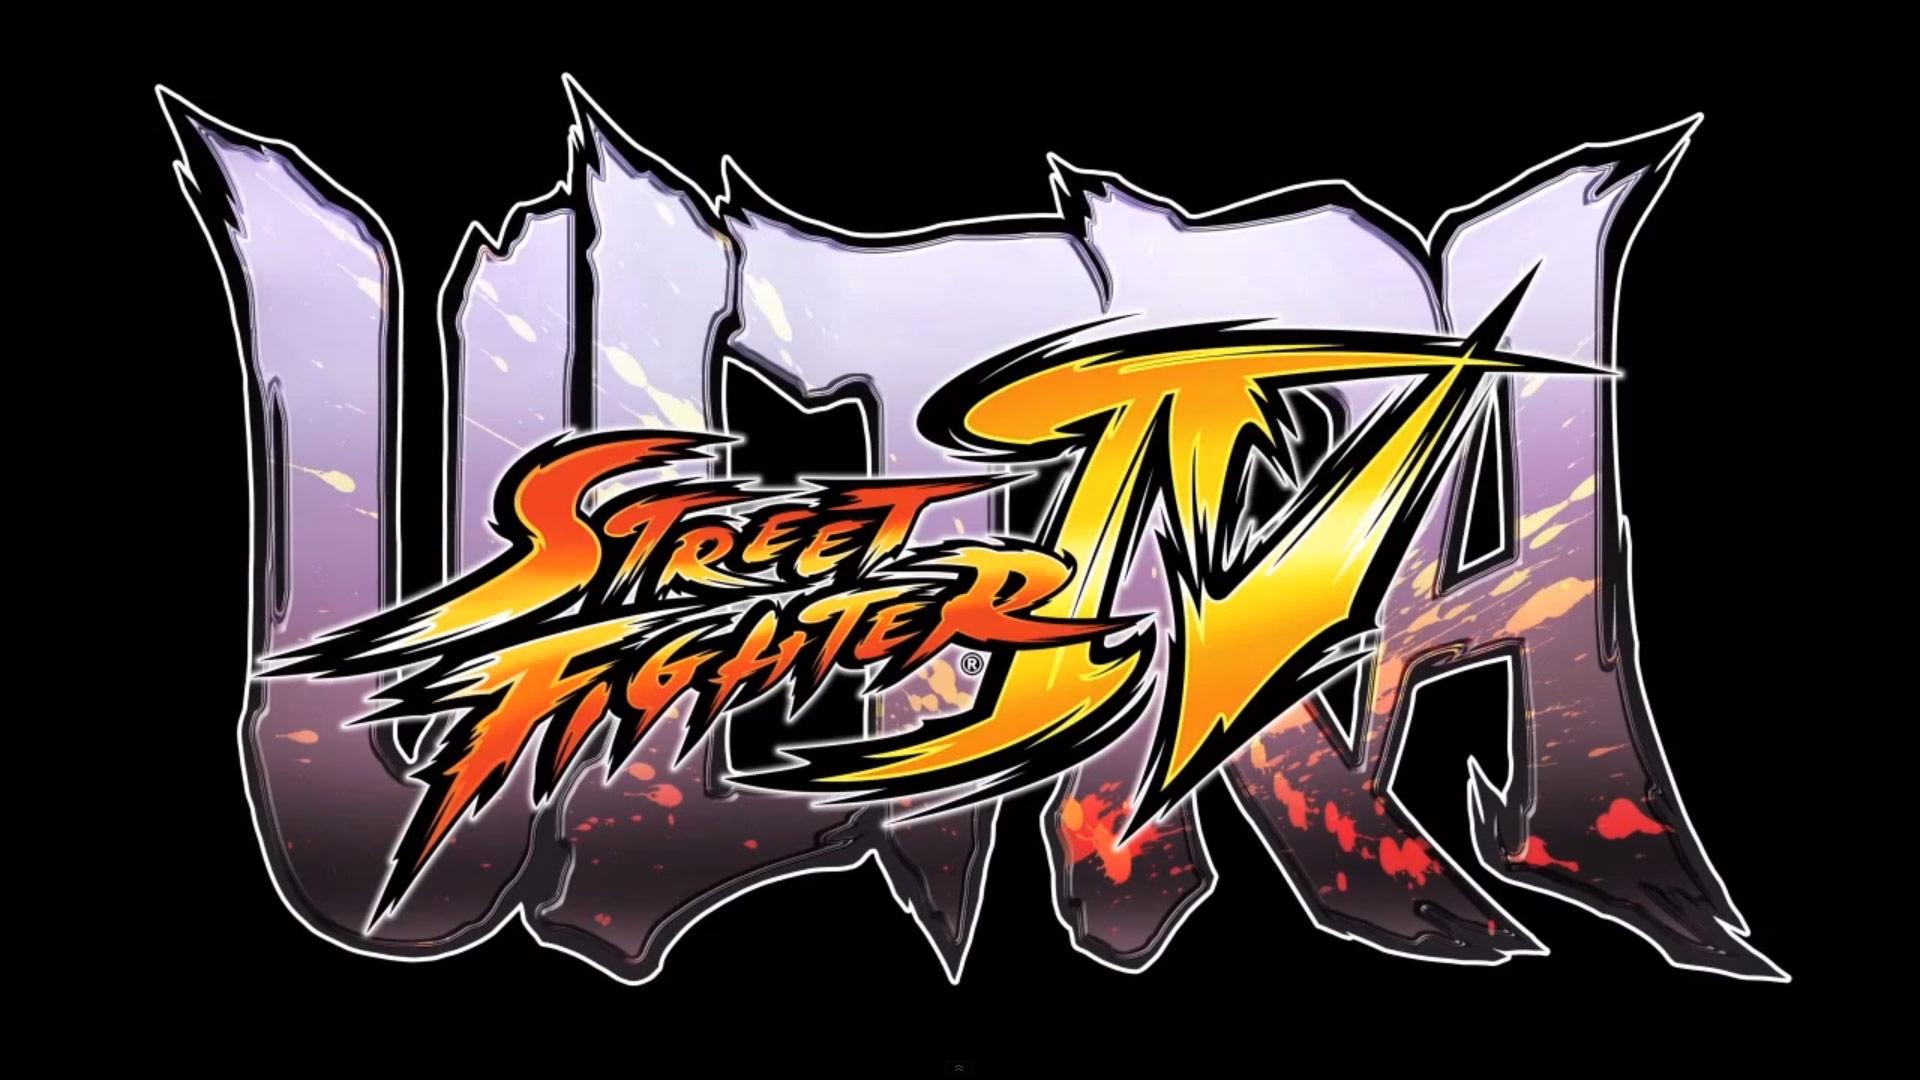 Jeu PC Ultra Street Fighter IV jouable gratuitement ce week-end